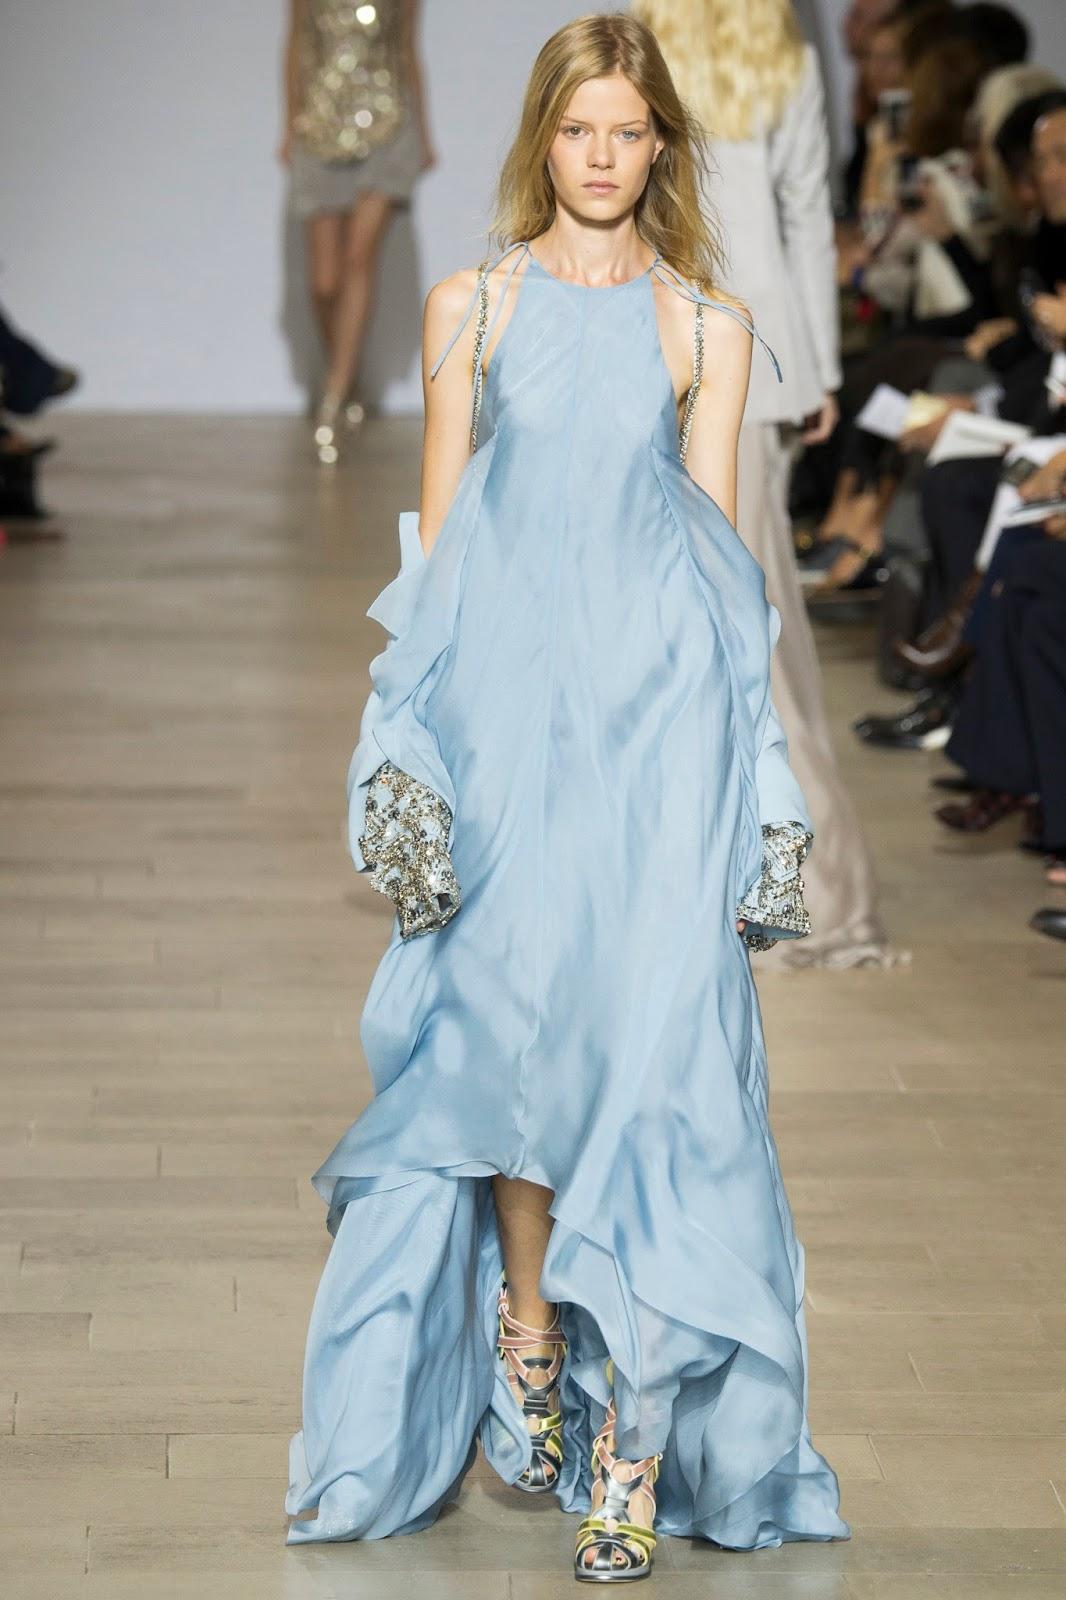 Antonio Berardi Spring/Summer 2016 / London fashion week via www.fashionedbylove.co.uk